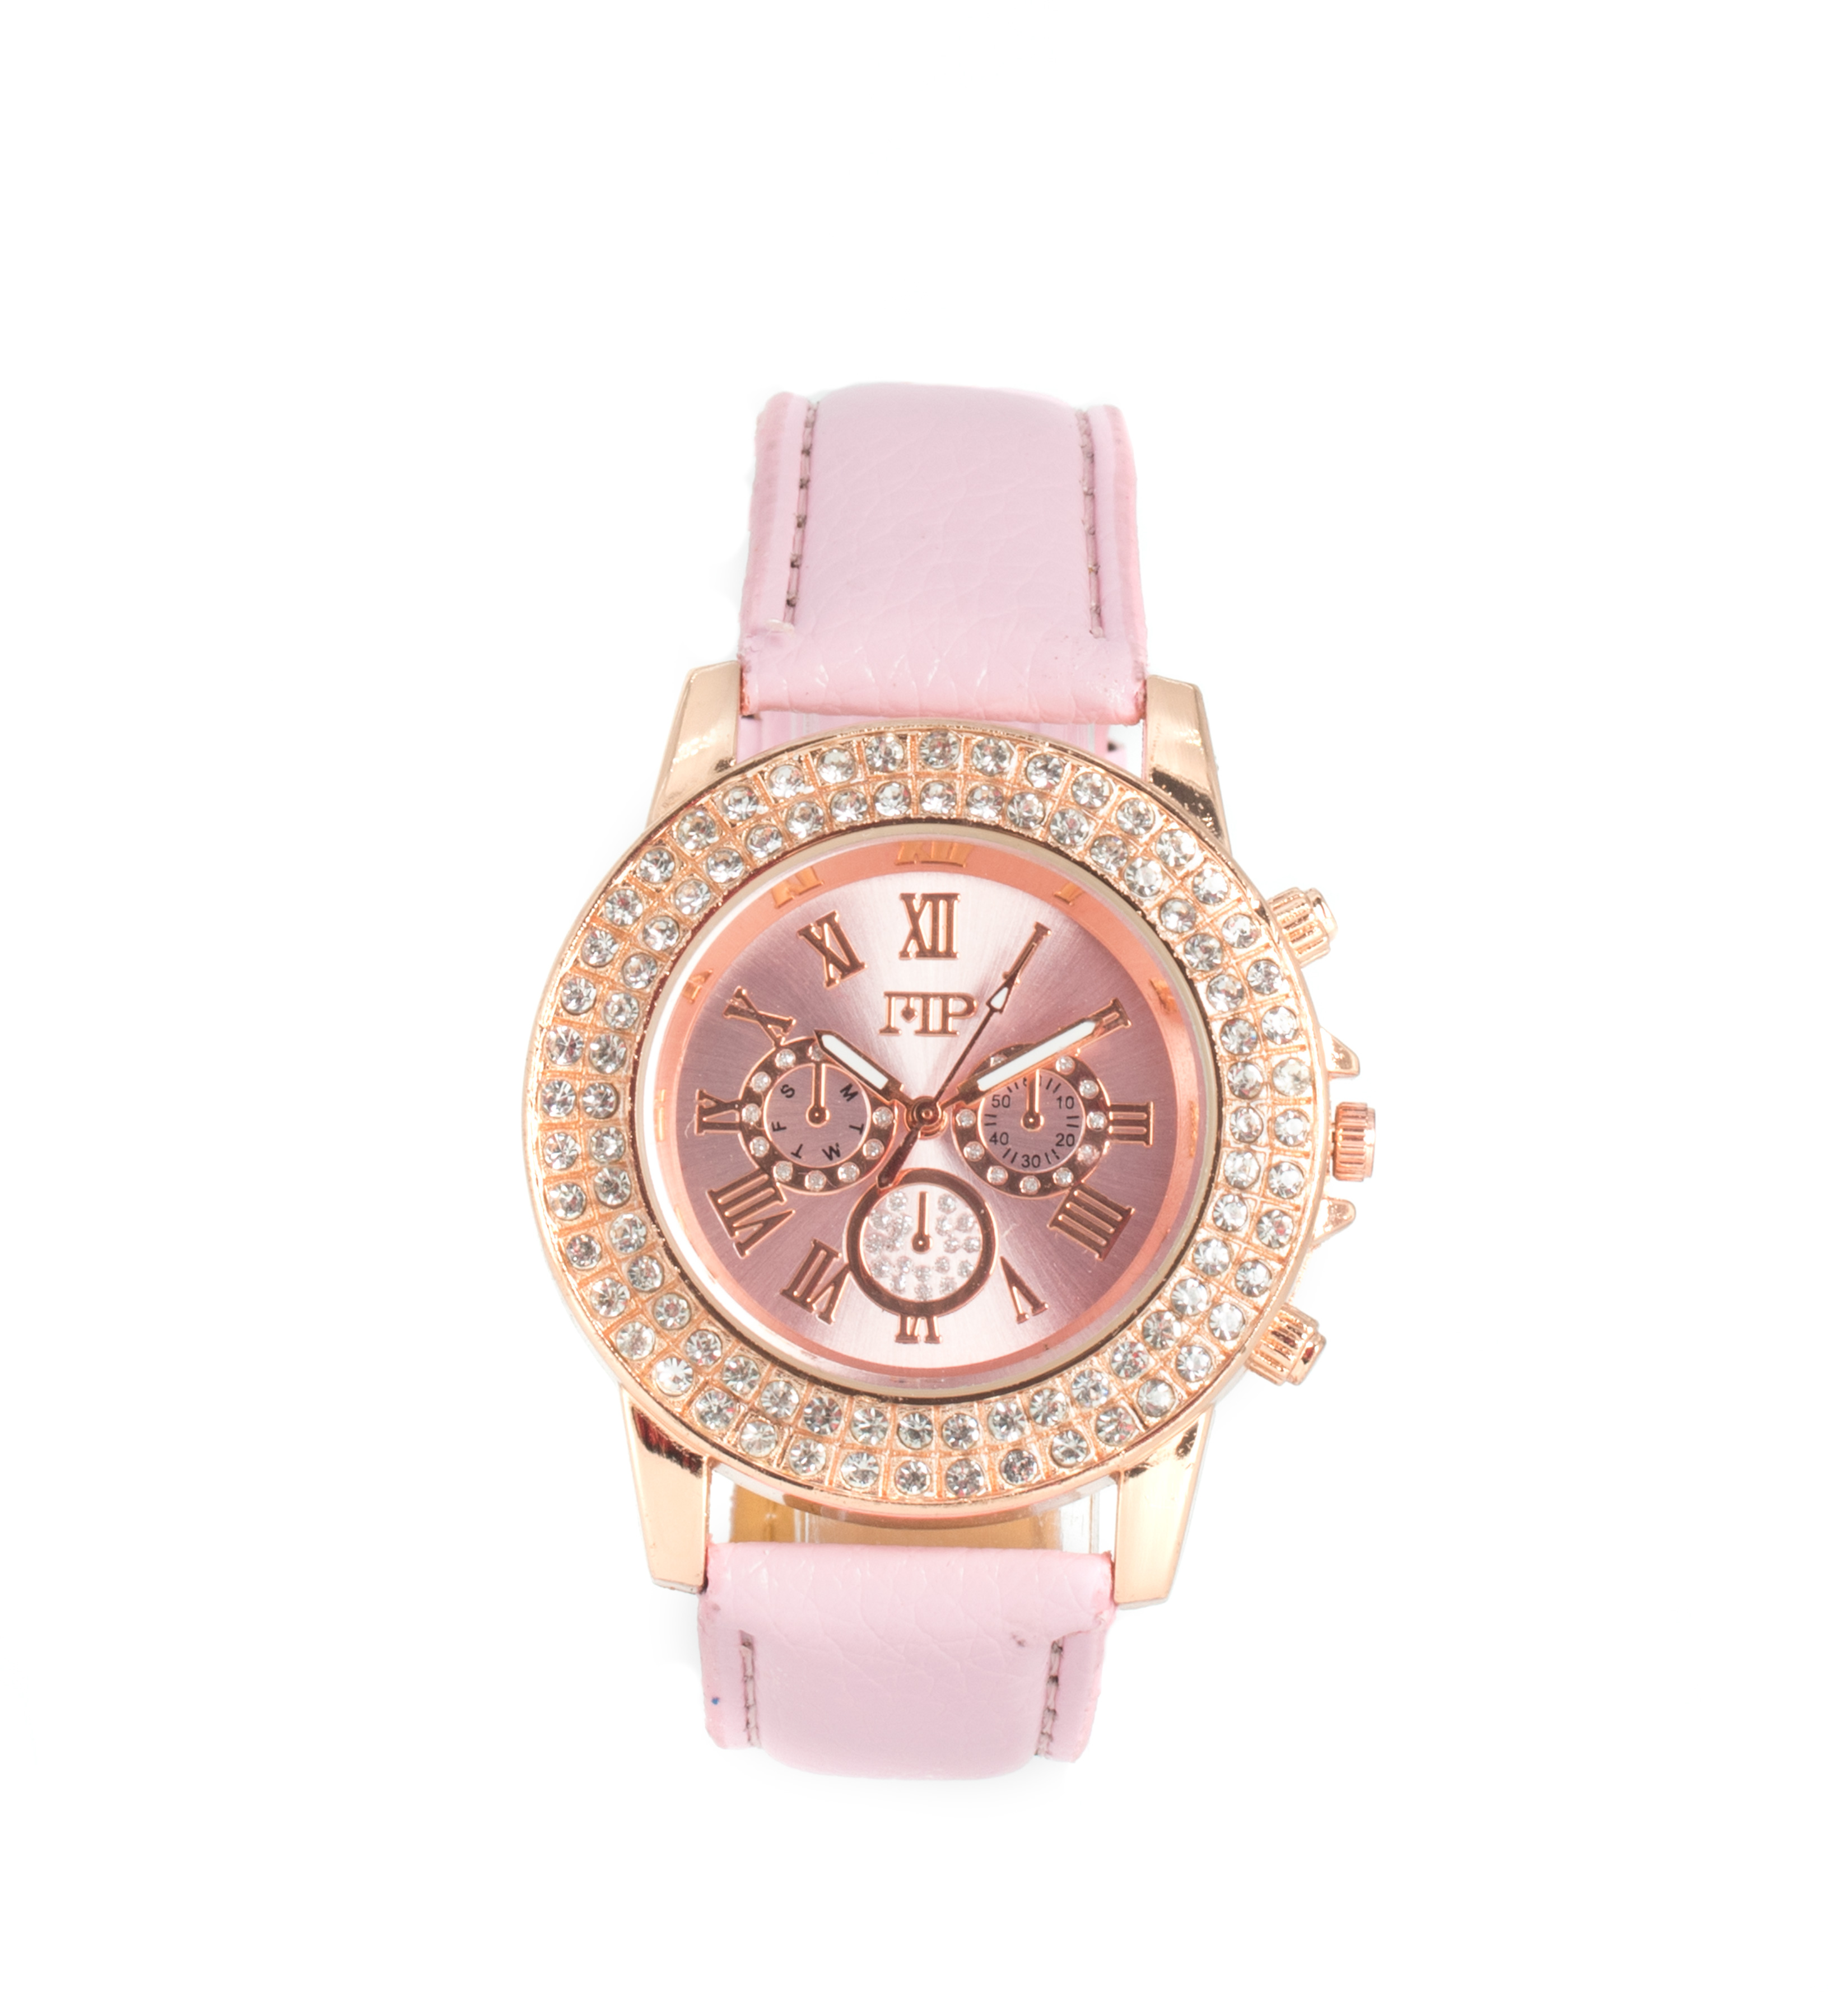 Comprar Marsan Piel Horloge analogique rose Asie